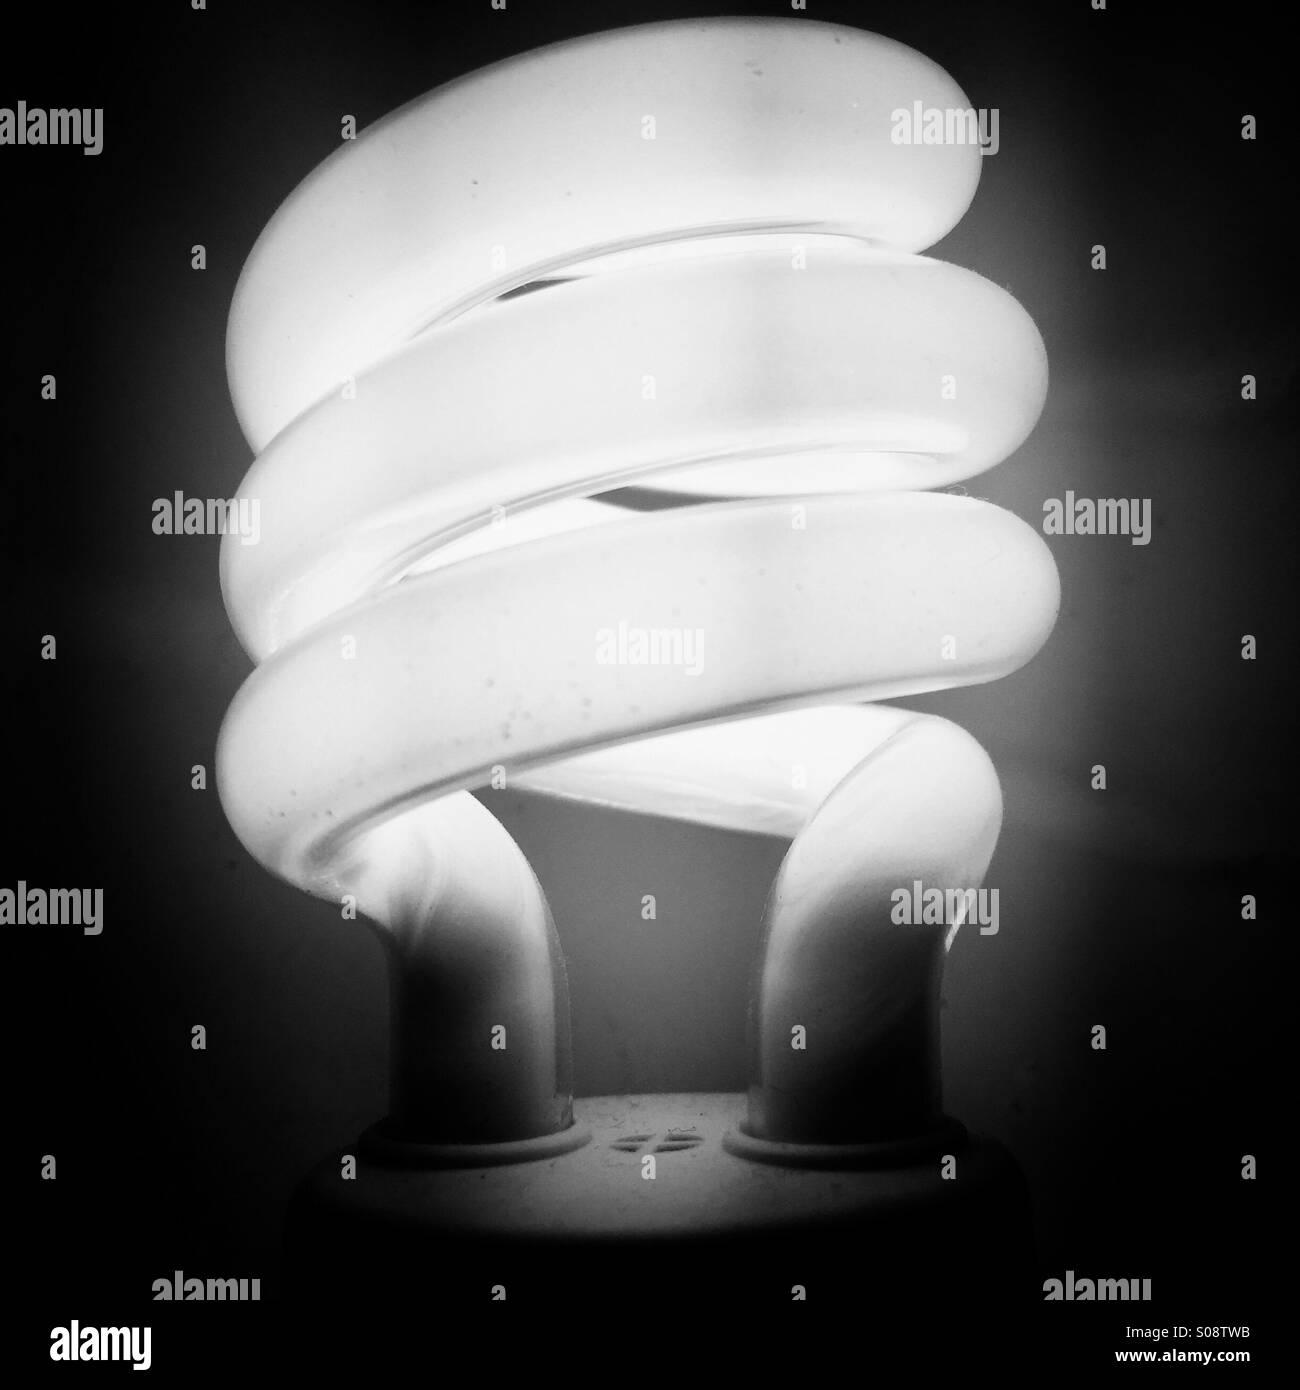 Energy efficient light bulb - Stock Image